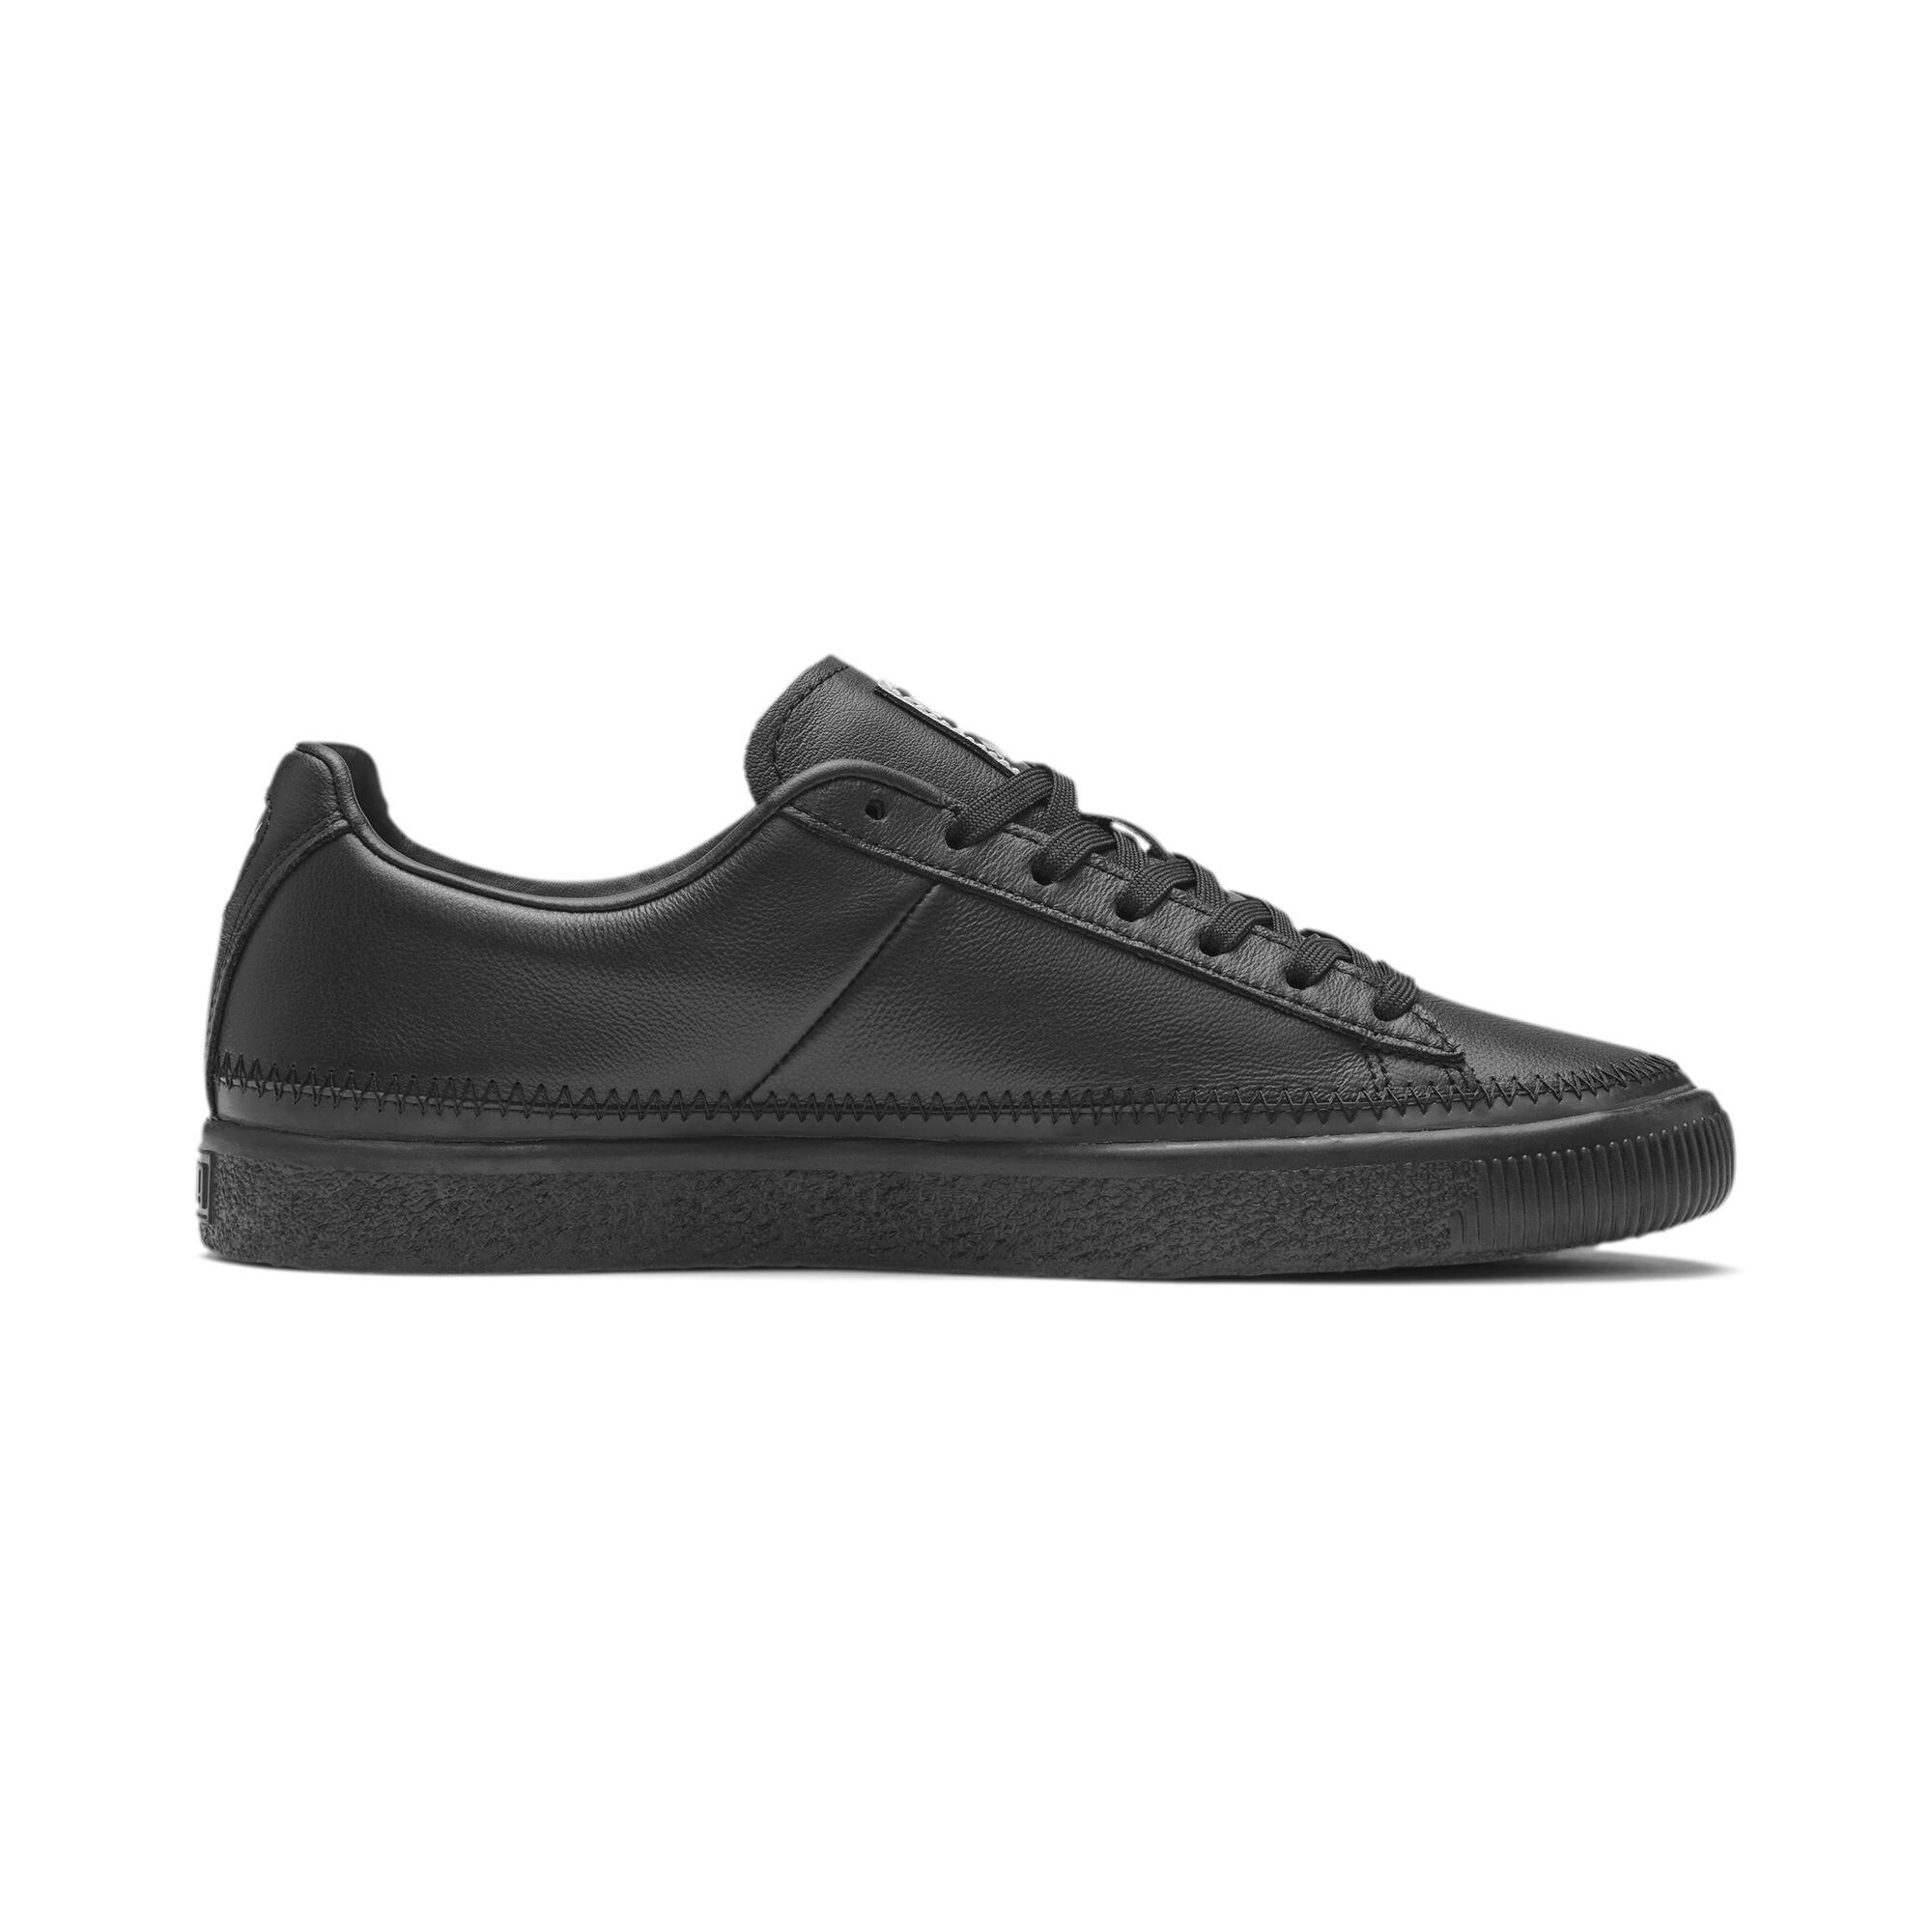 PUMA-Basket-Stitch-Sneaker-Unisex-Schuhe-Neu Indexbild 12